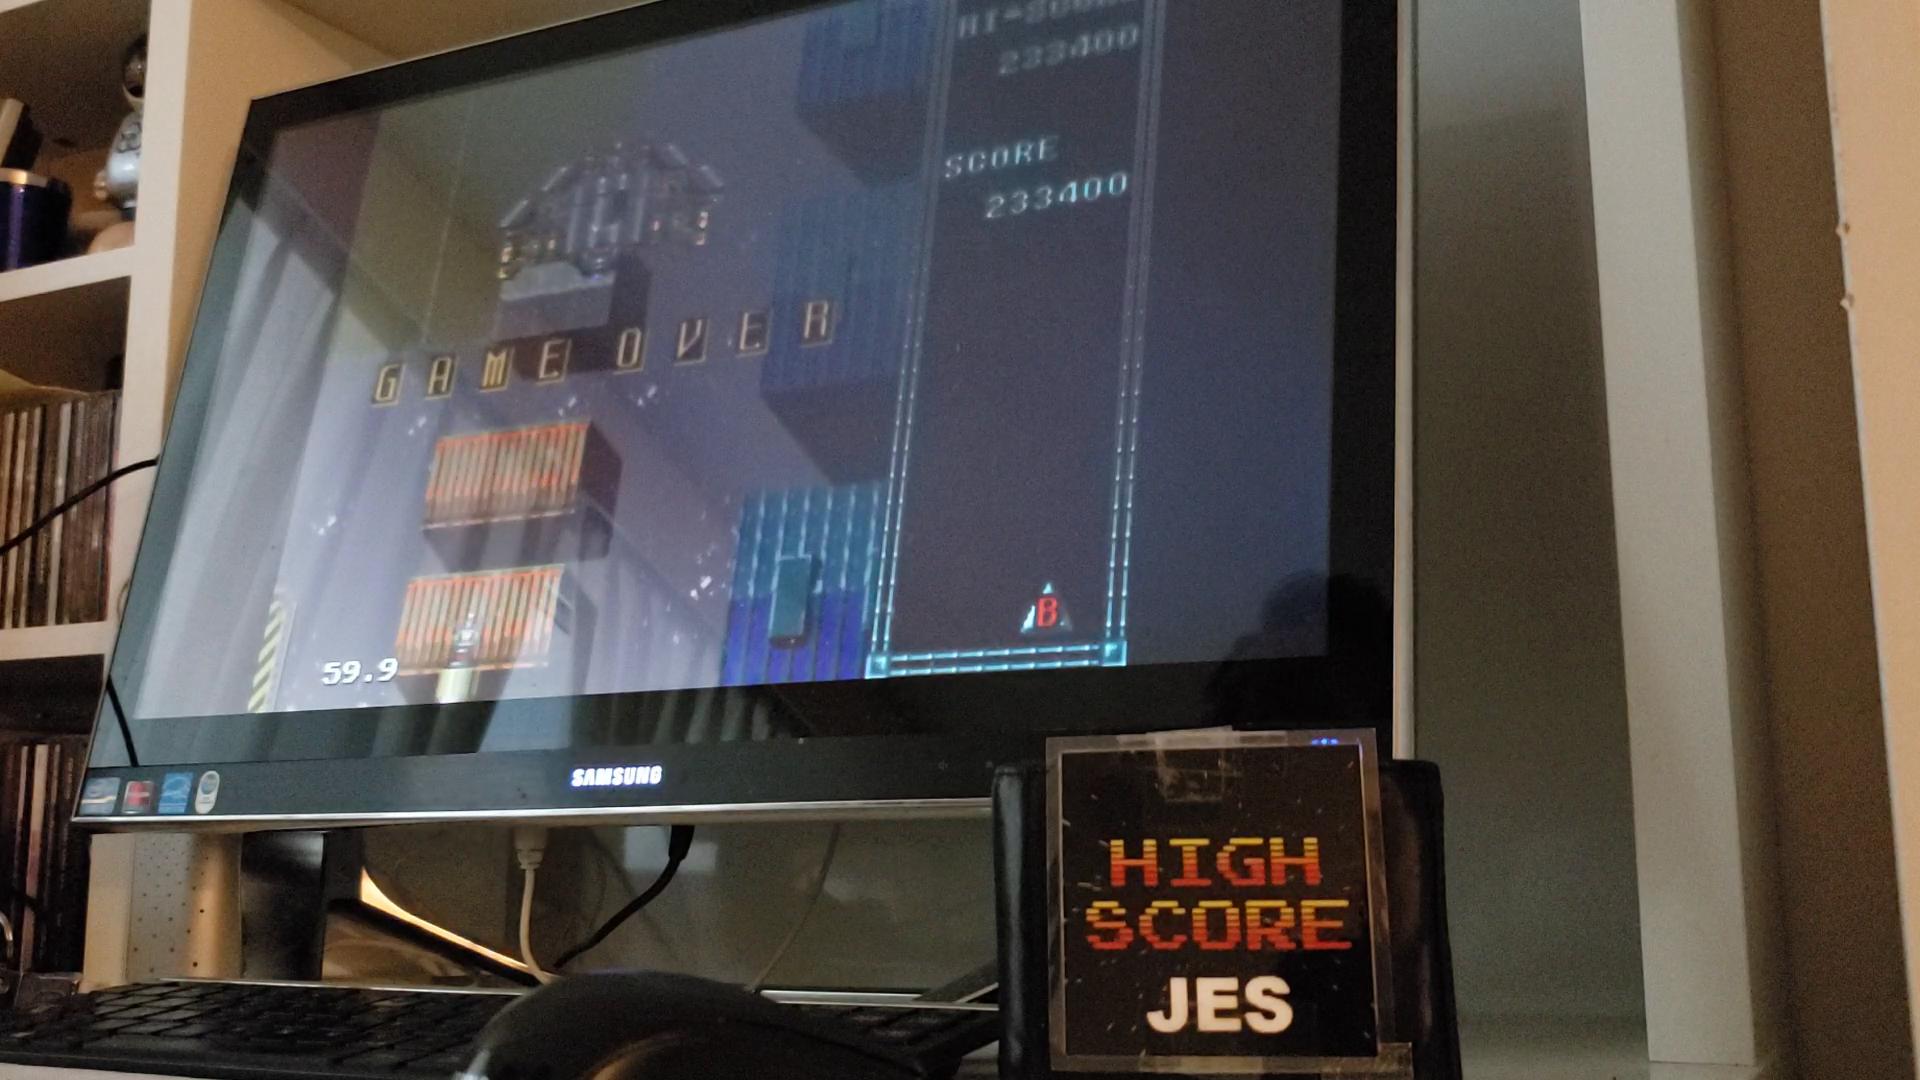 JES: Raiden Trad [Normal] (Sega Genesis / MegaDrive Emulated) 233,400 points on 2020-09-24 17:00:33